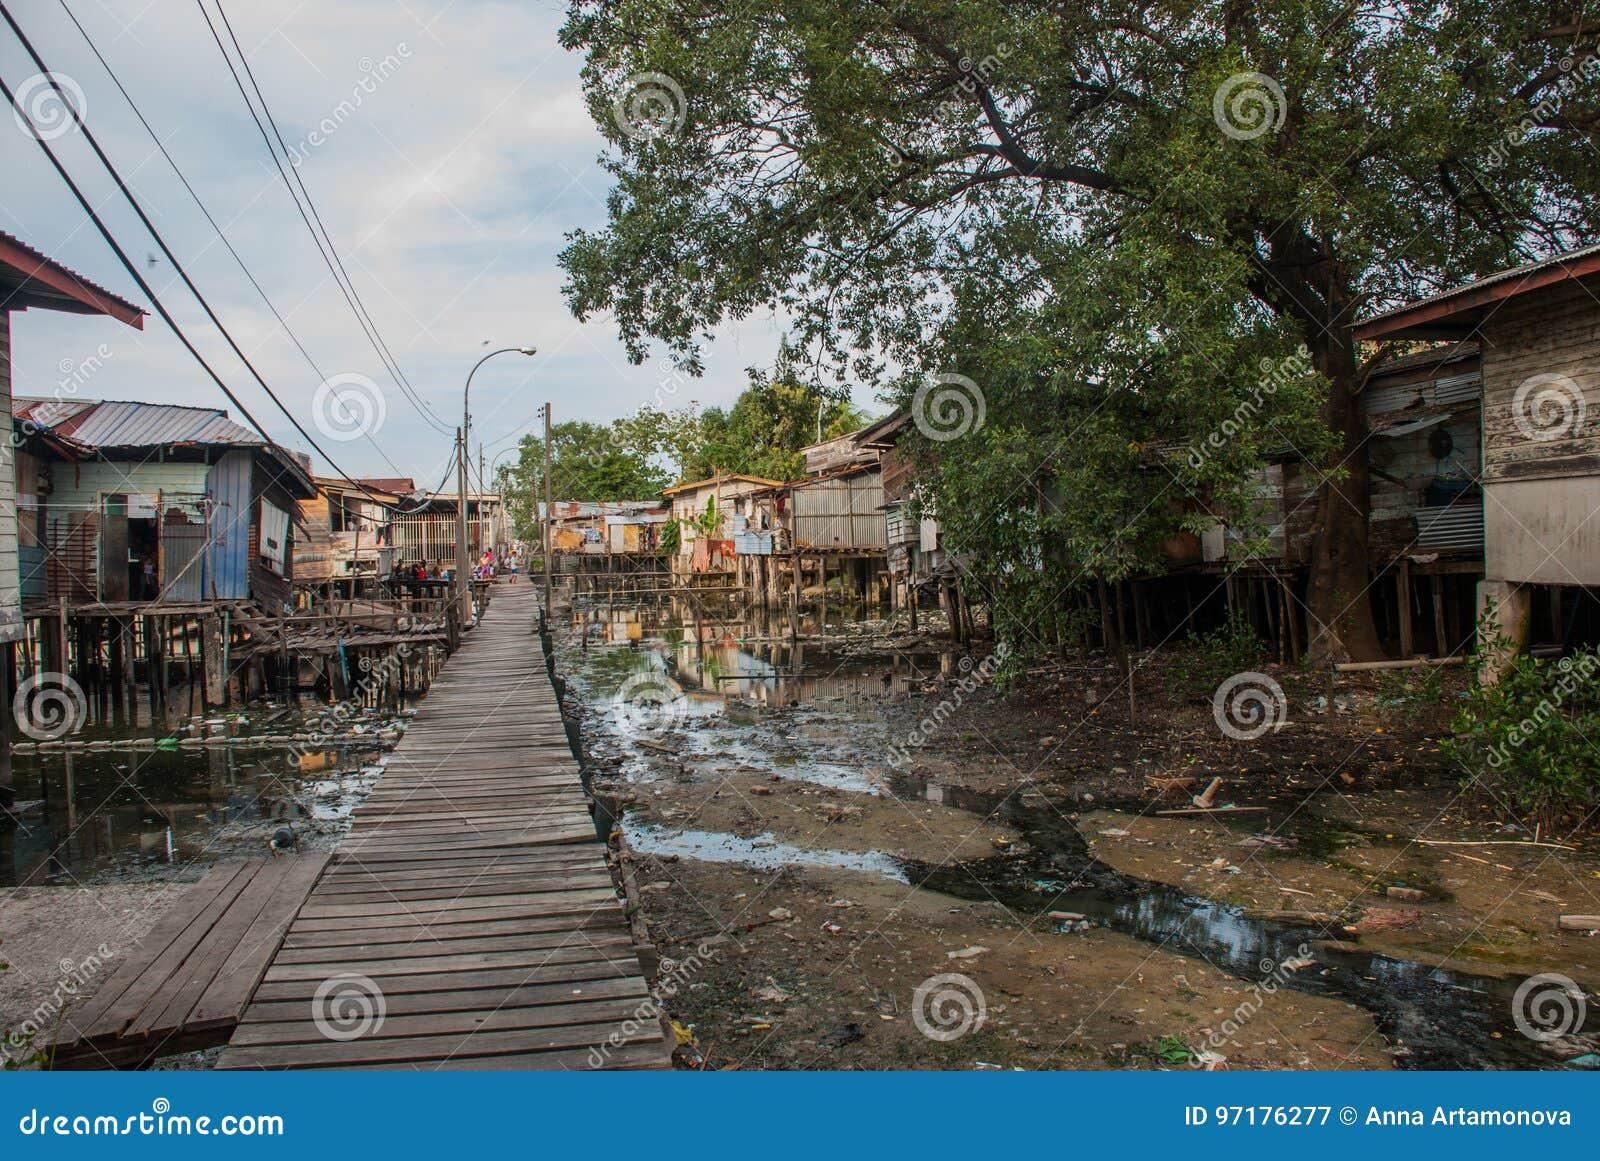 Häuser Auf Stelzen Kota Kinabalu Sabah Malaysia Stockbild Bild